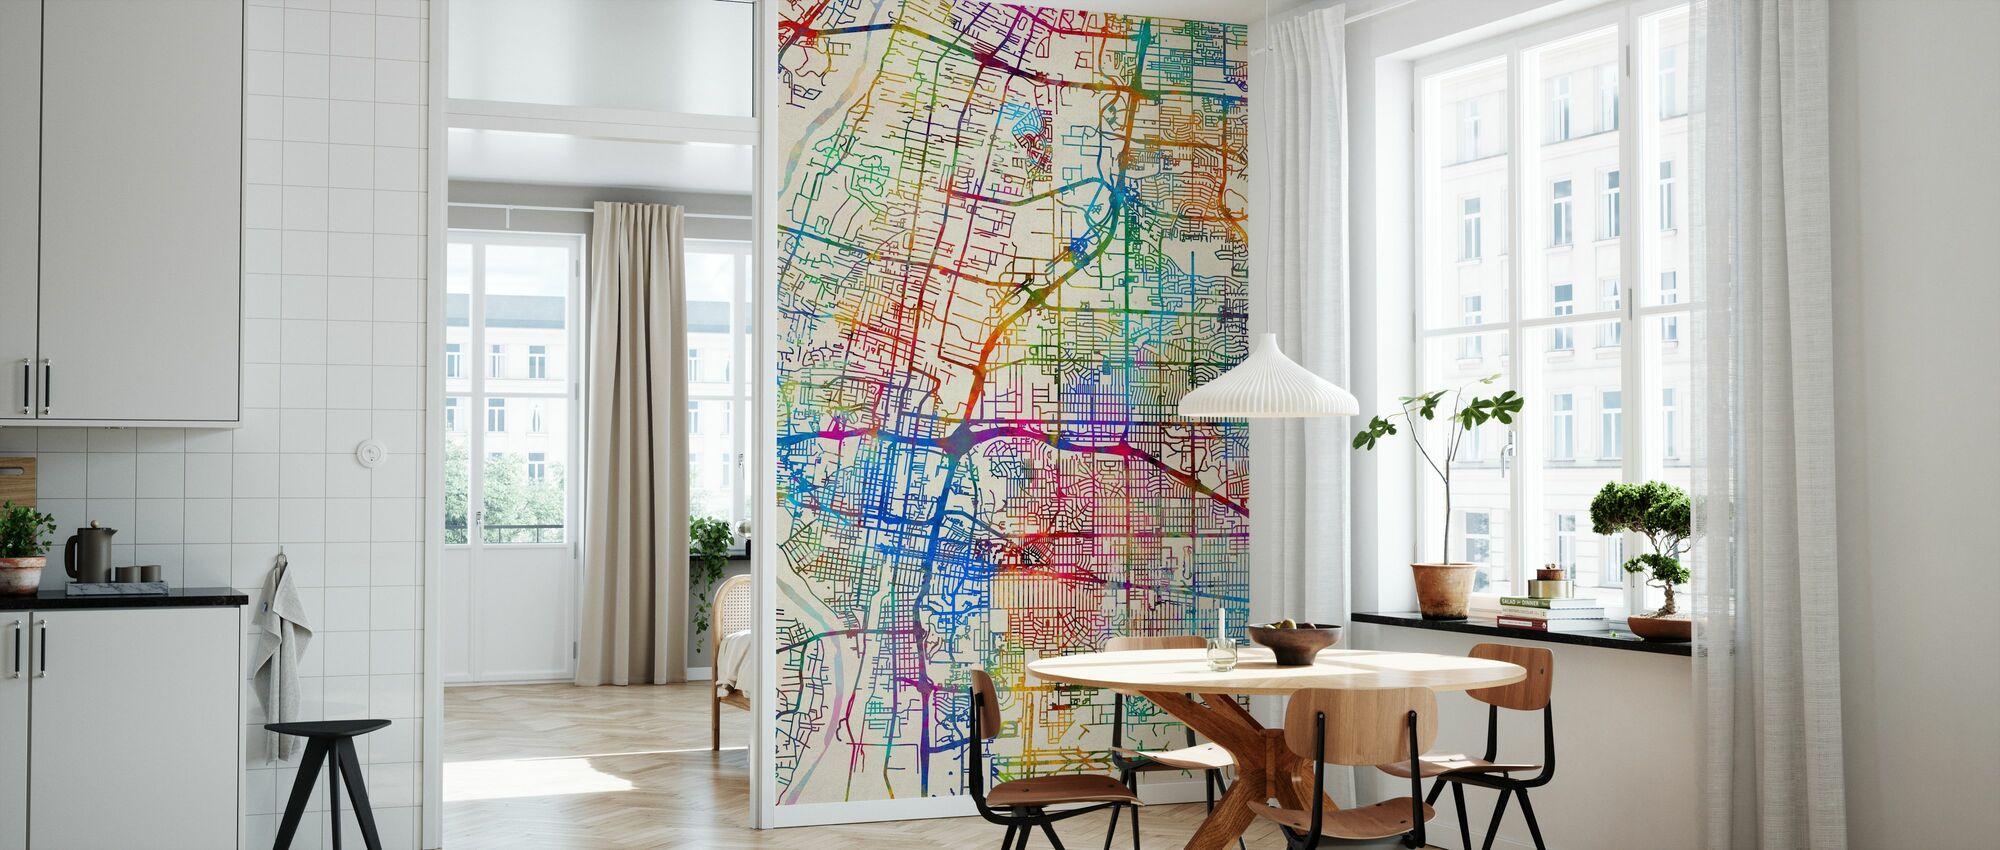 Albuquerque New Mexico City Street Map - Wallpaper - Kitchen